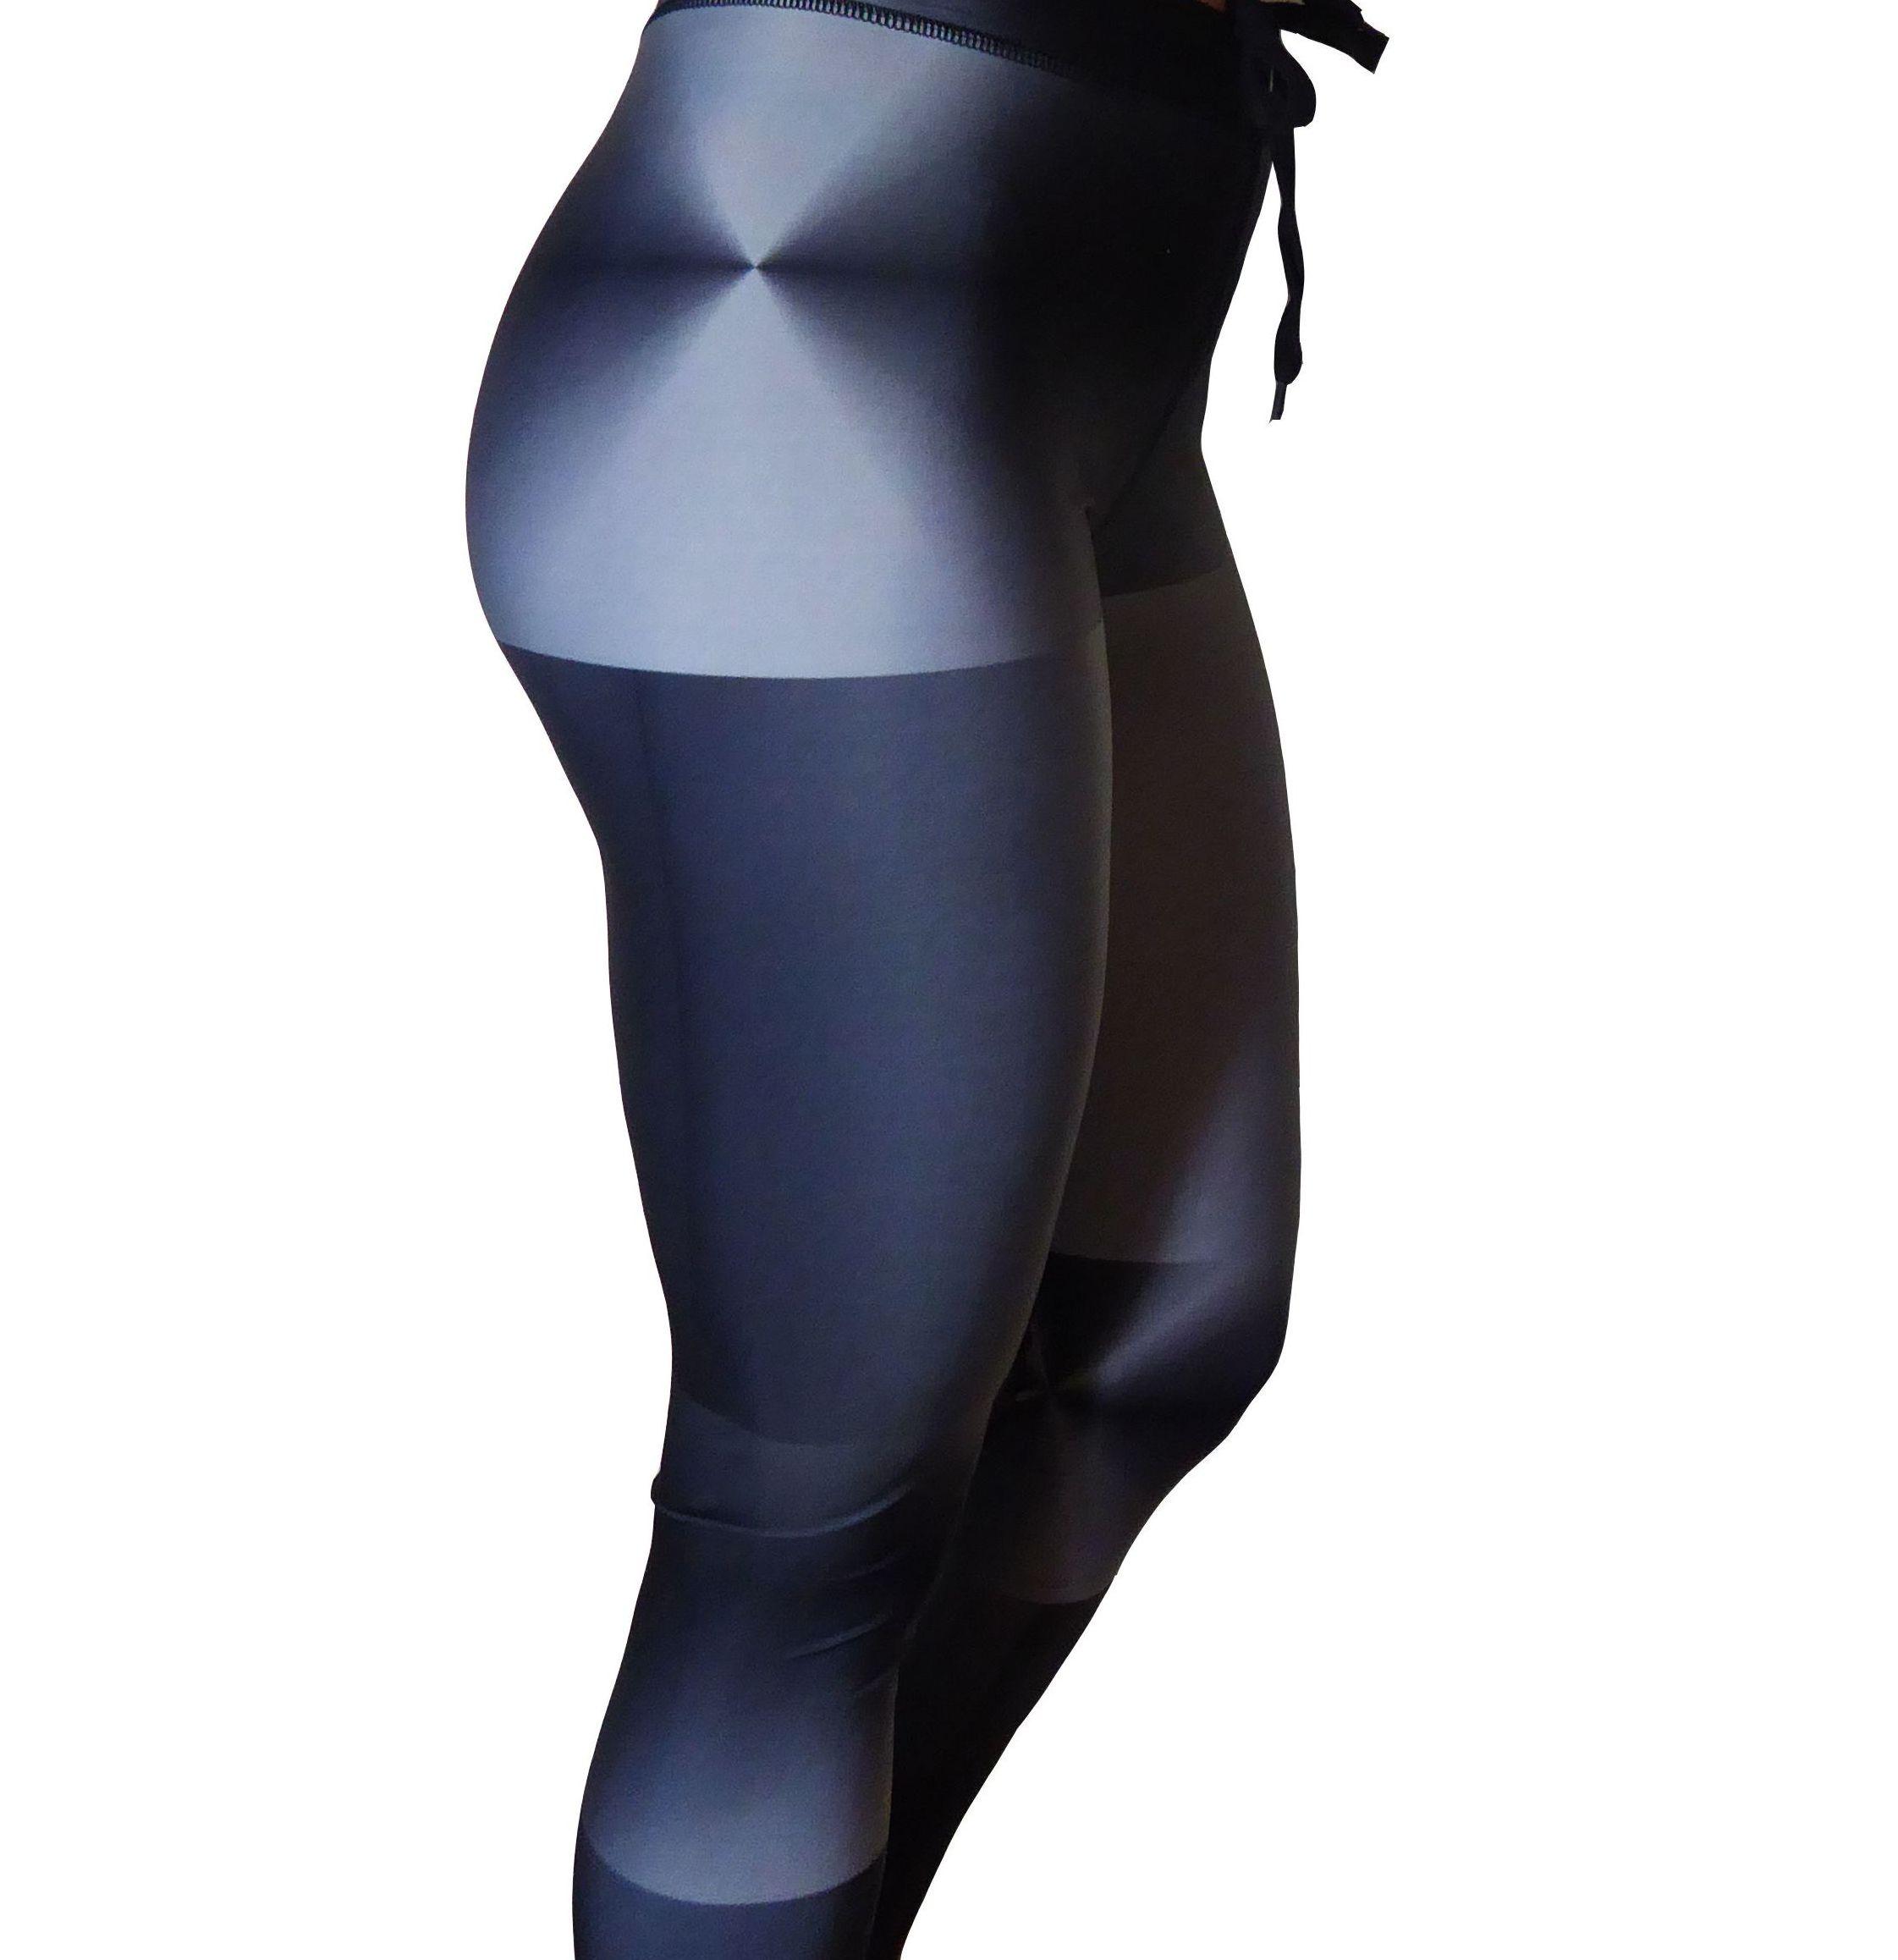 Grey fitness leggings